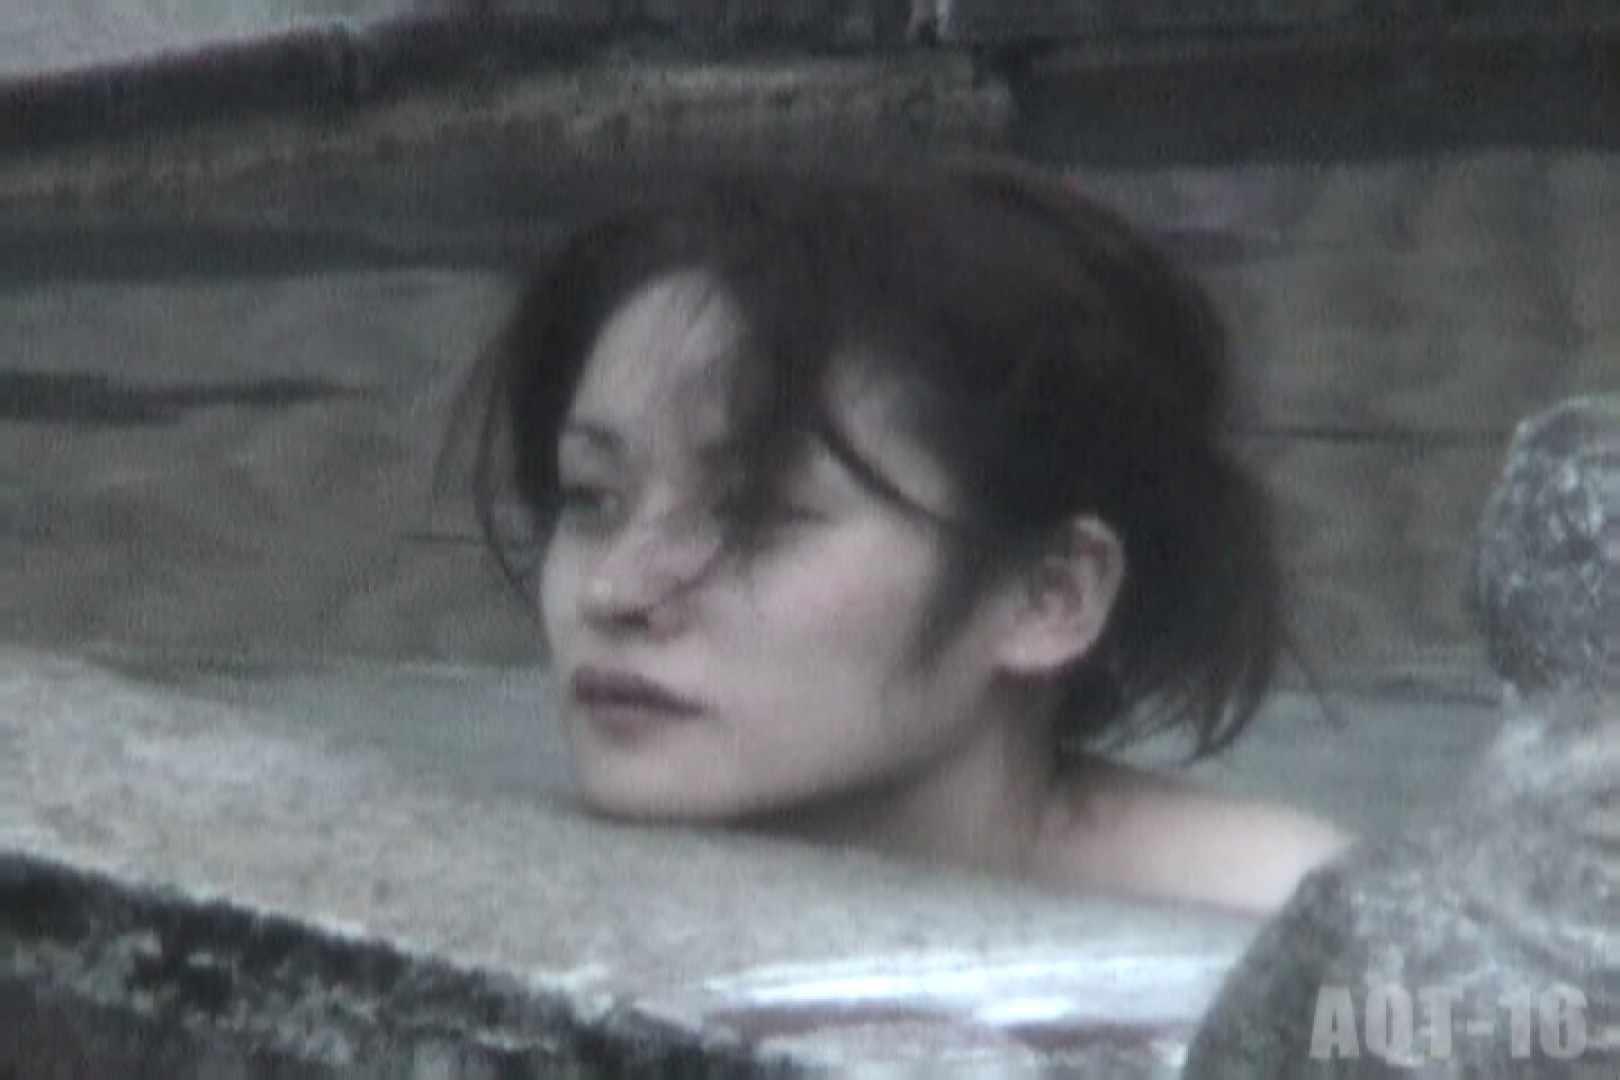 Aquaな露天風呂Vol.839 盗撮師作品  96pic 90